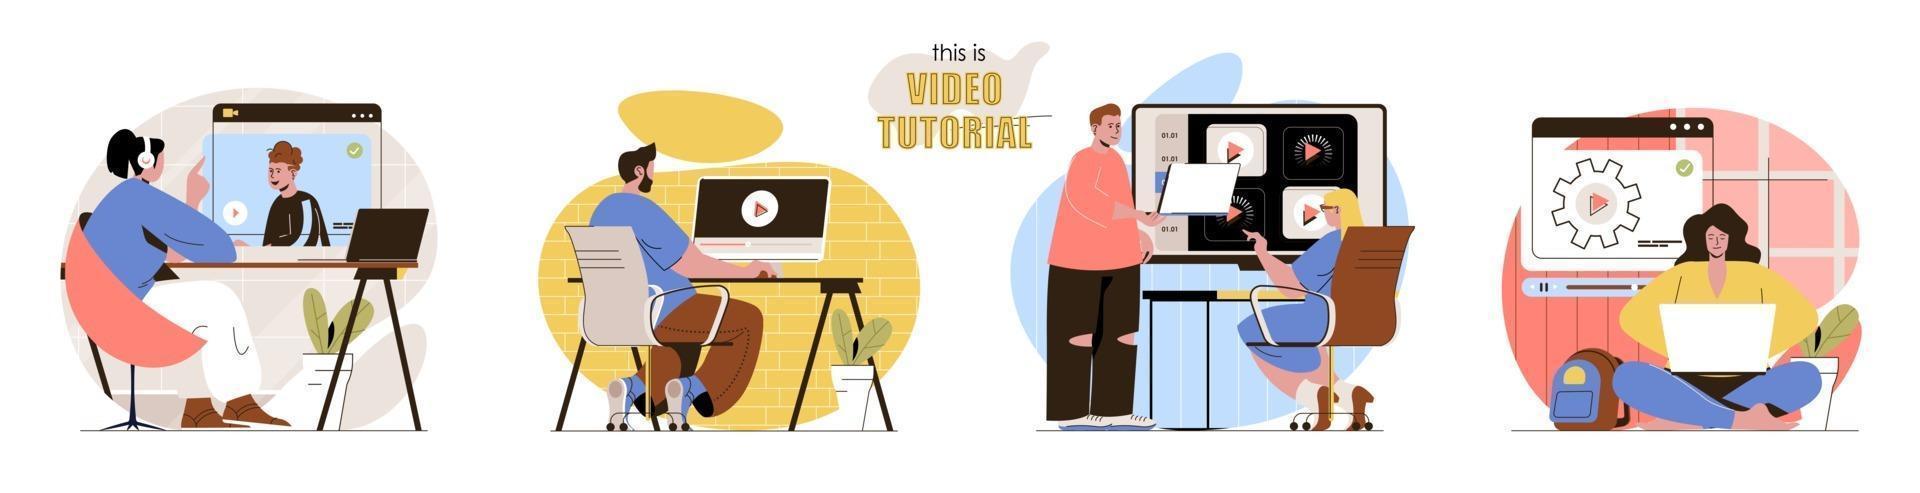 This is Video Tutorial concept scenes set vector